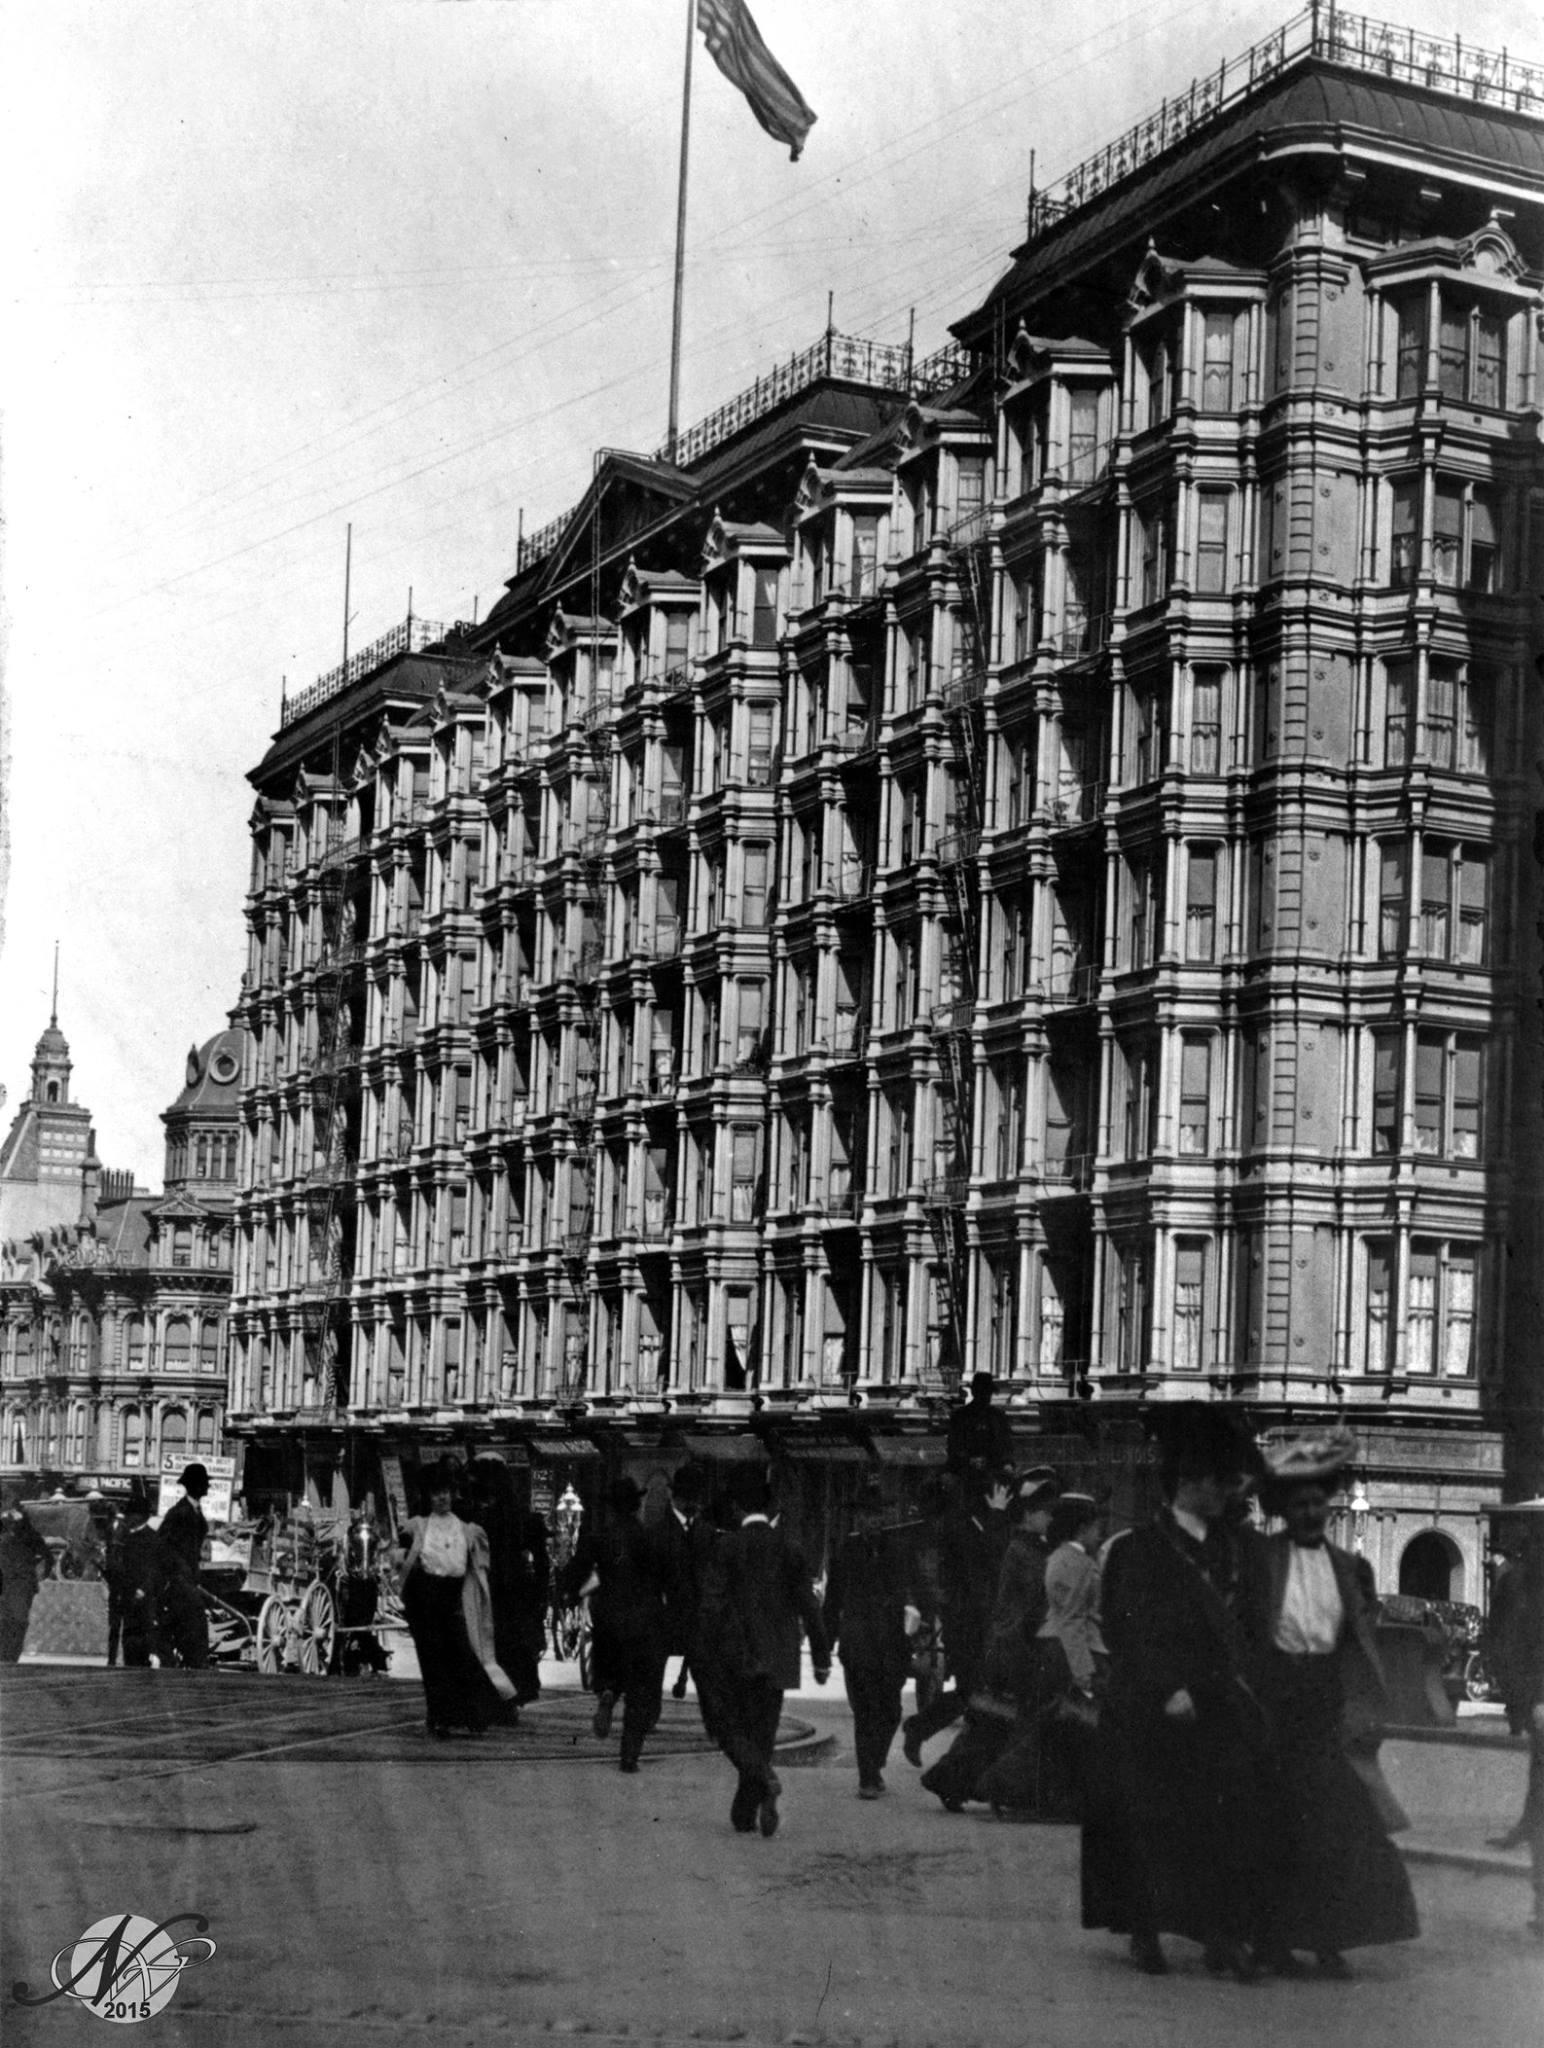 April 15th 1906